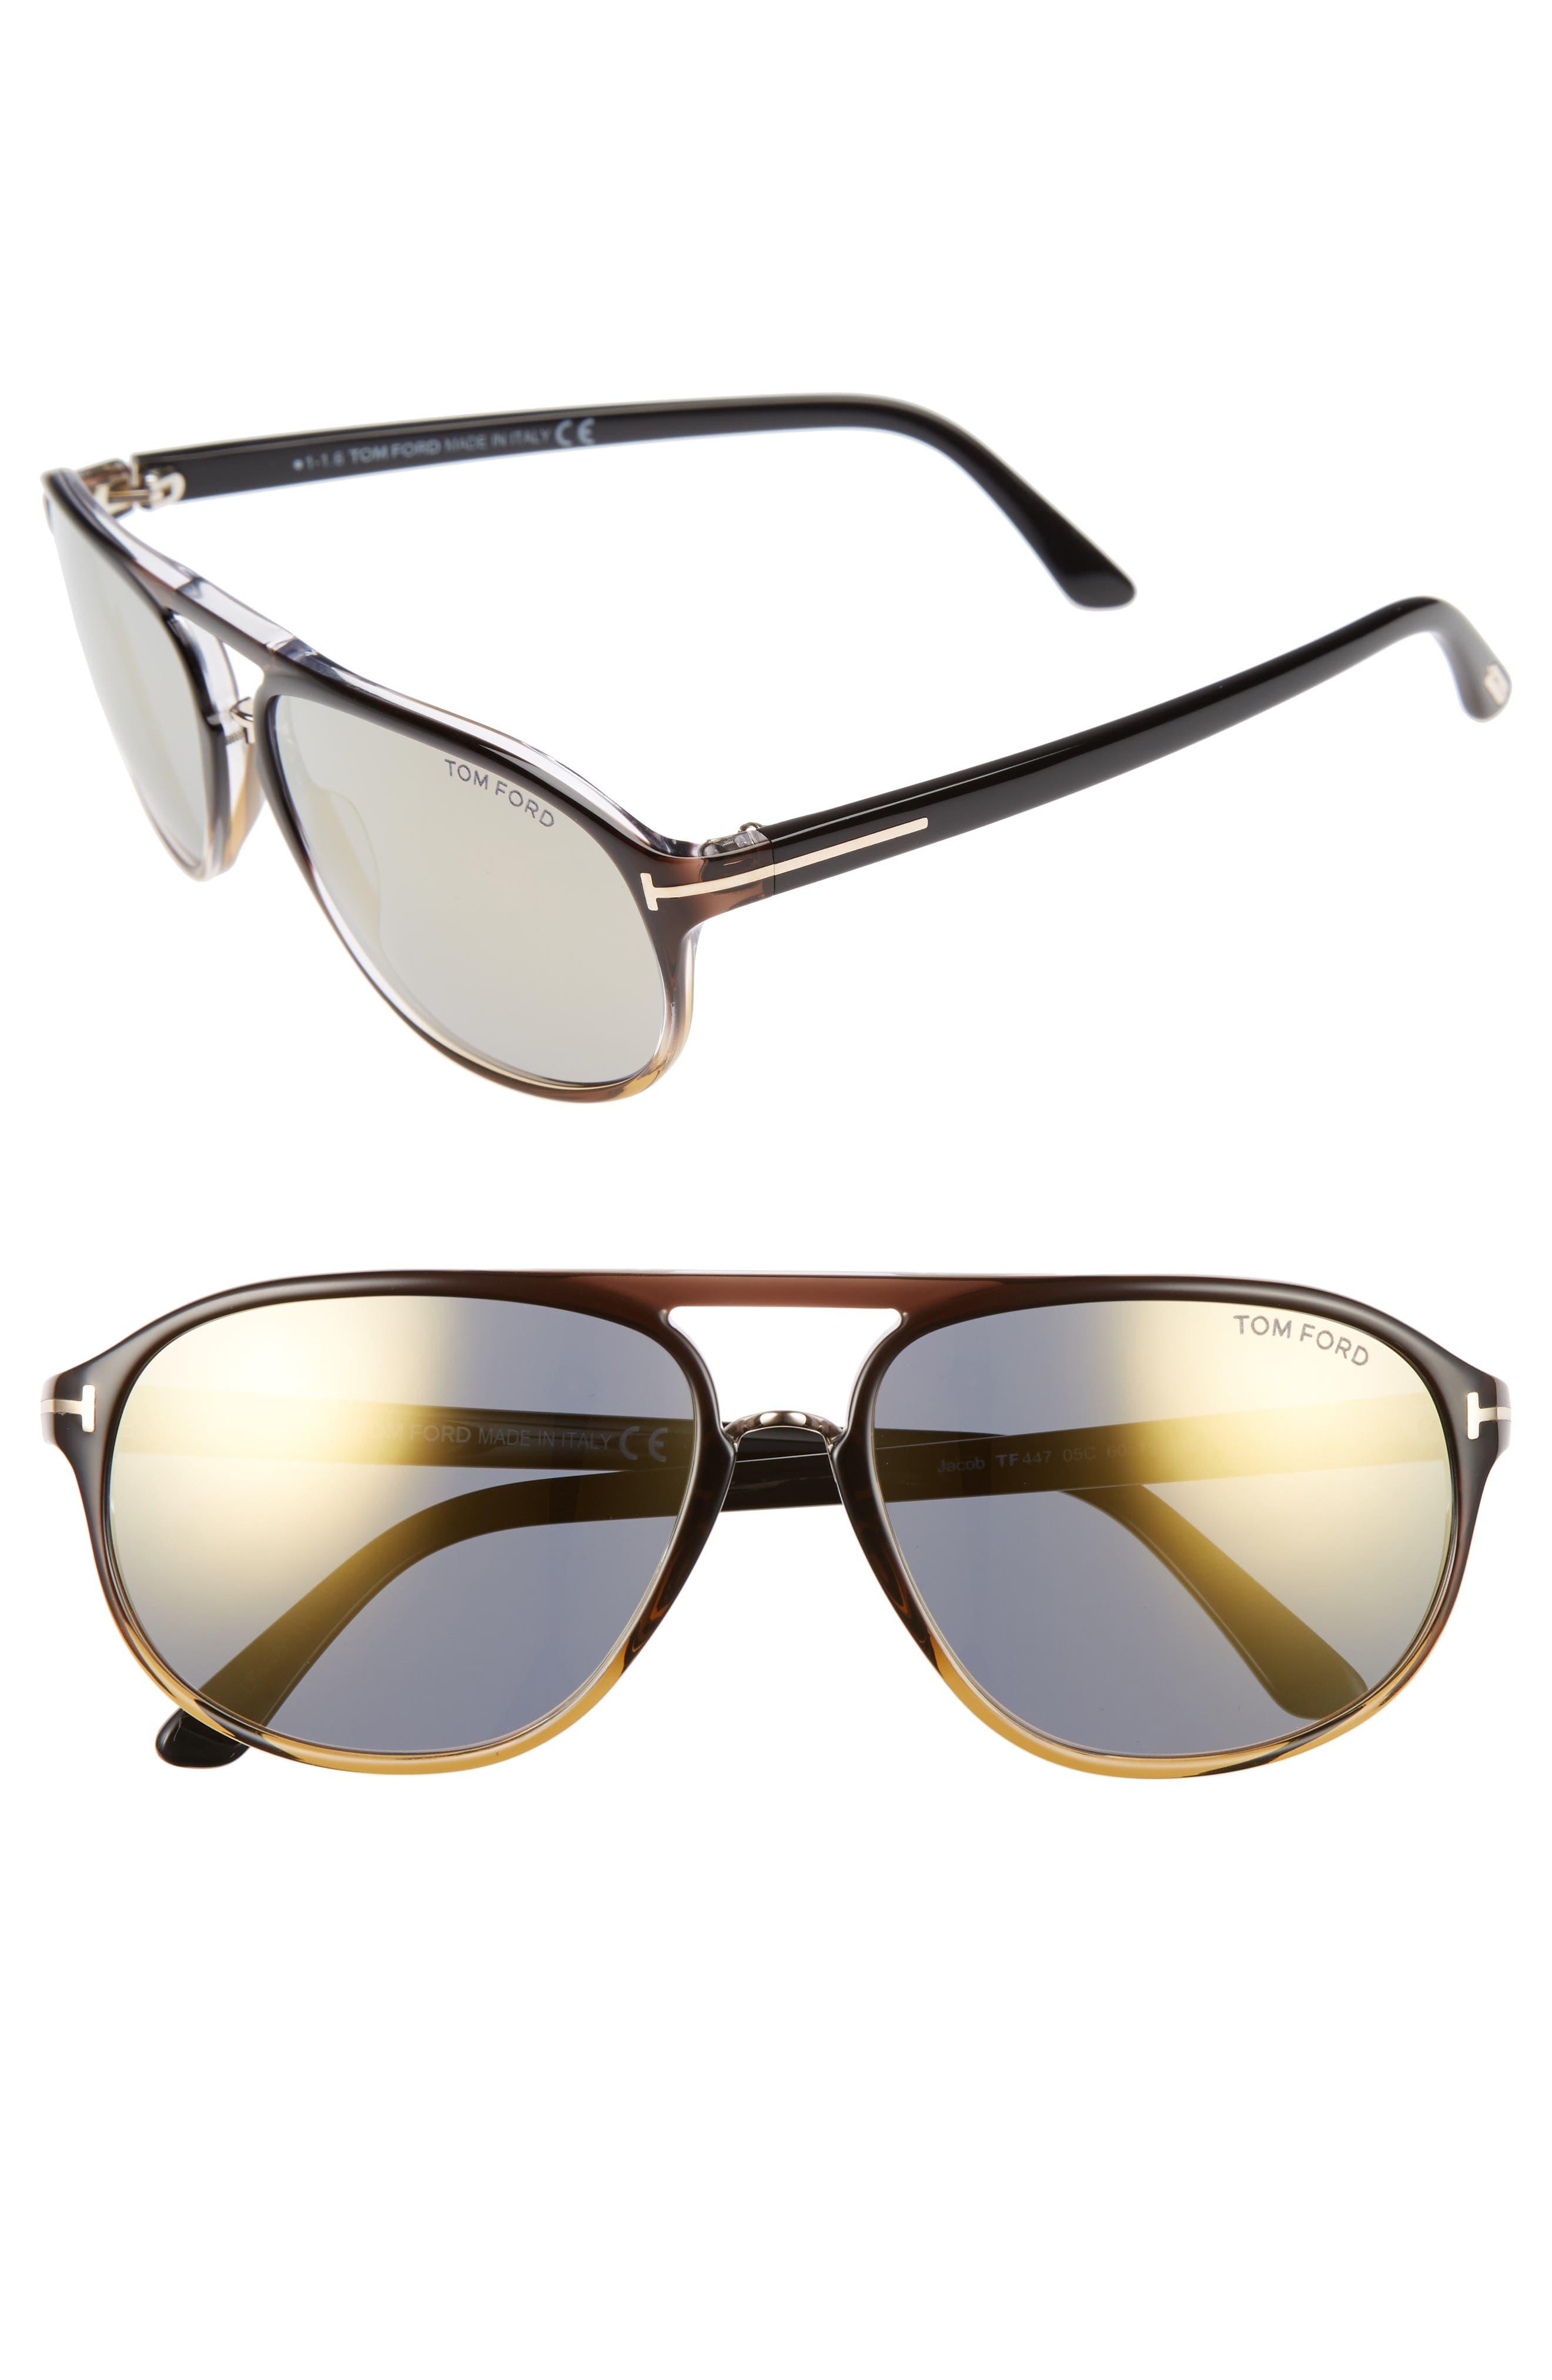 Alternate Image 1 Selected - Tom Ford Jacob 60mm Retro Sunglasses